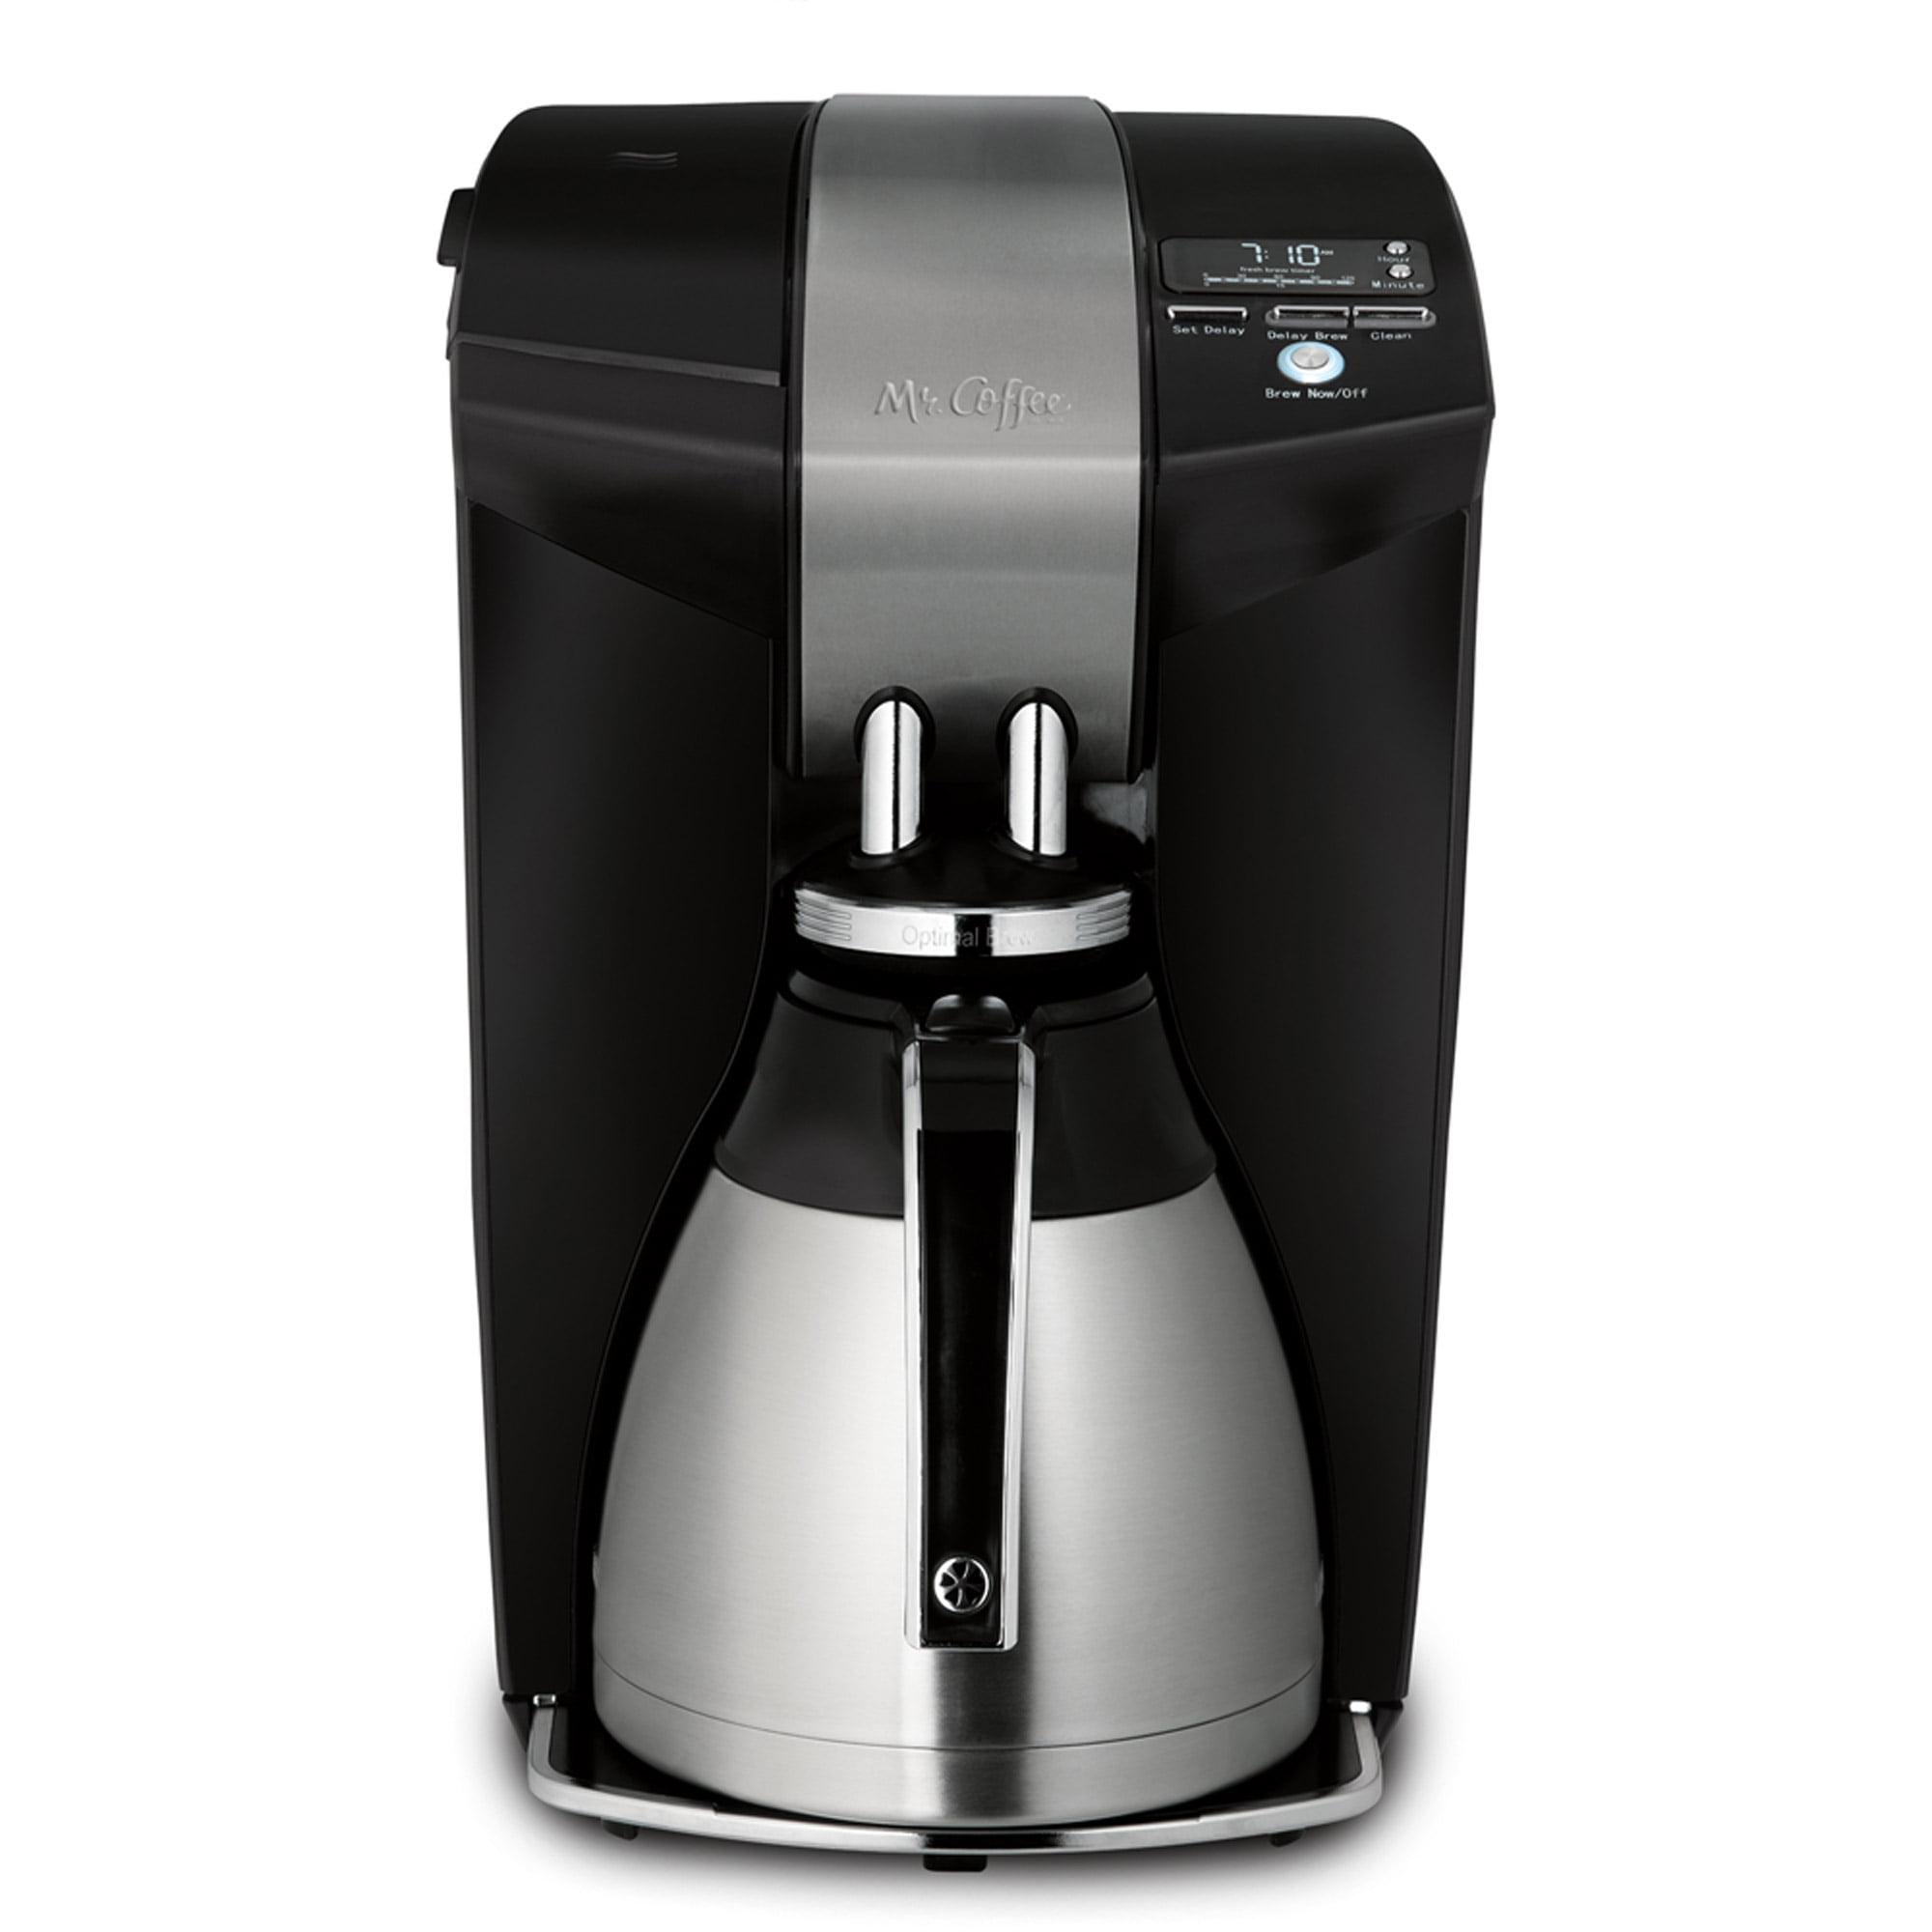 Mr. Coffee Optimal Brew 12-Cup Thermal Coffeemaker, BVMC-SCTX91WM